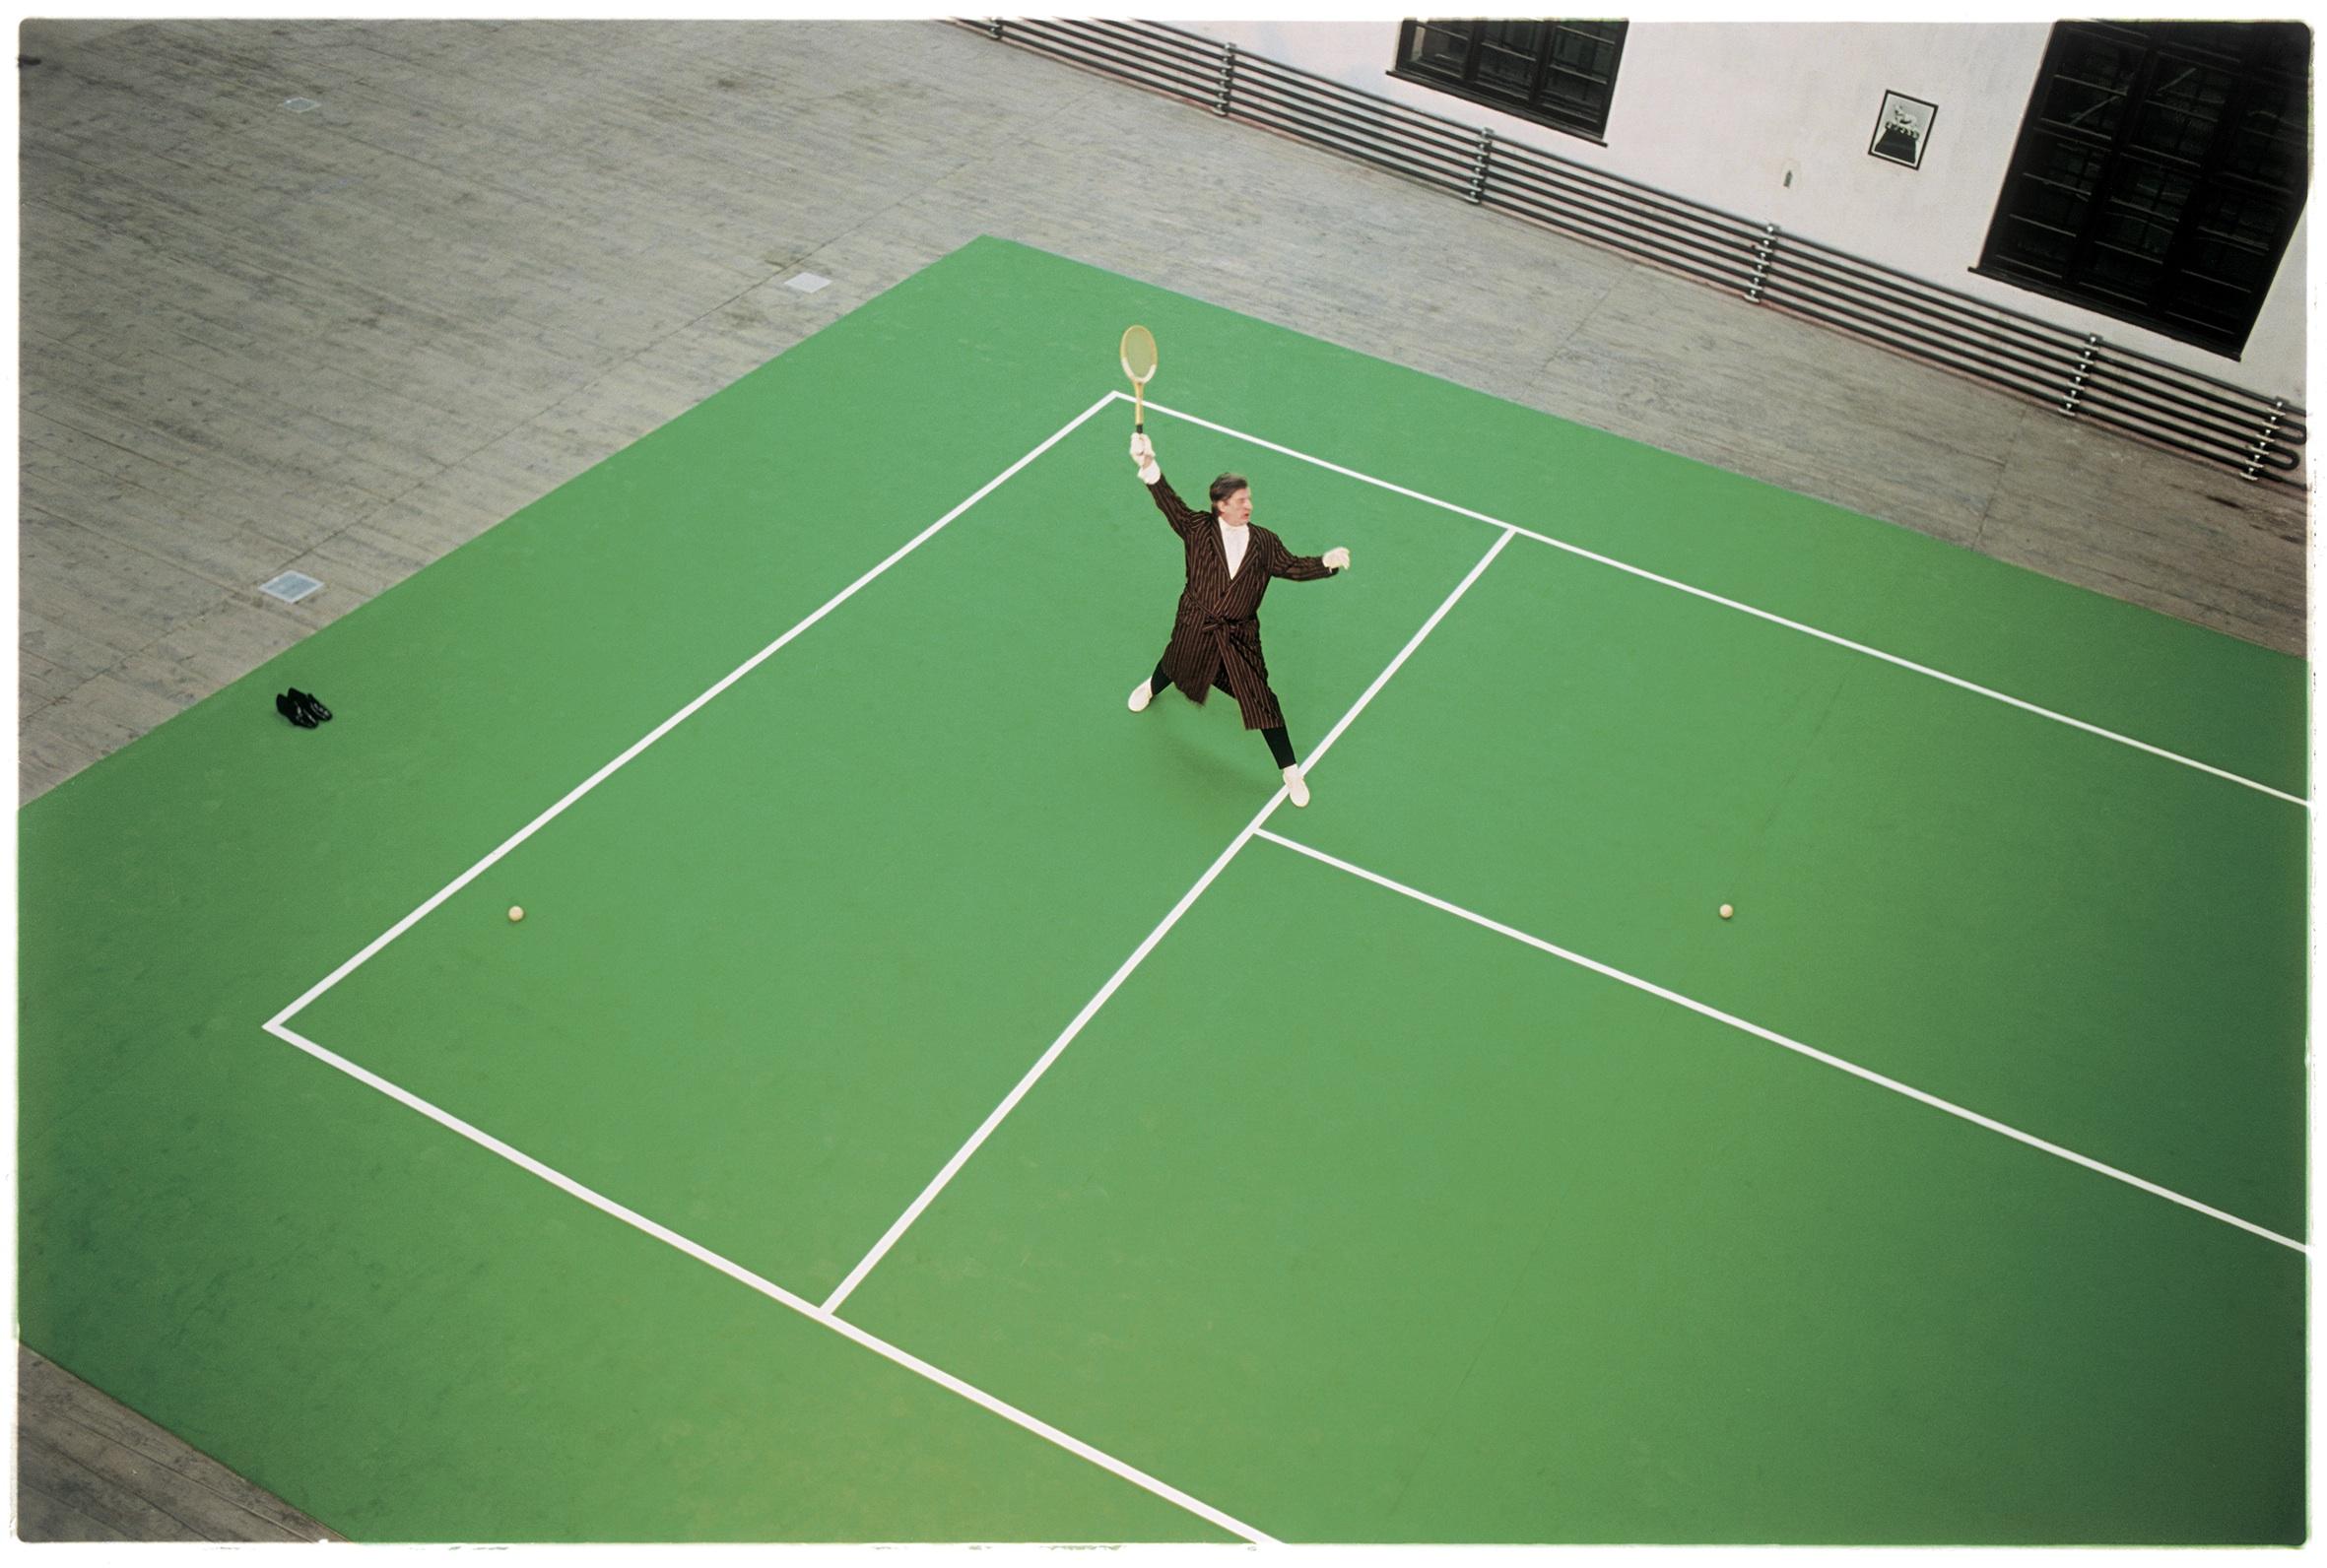 P. Dressler, Aus Tie Break, 1996 © Fotohof Archiv